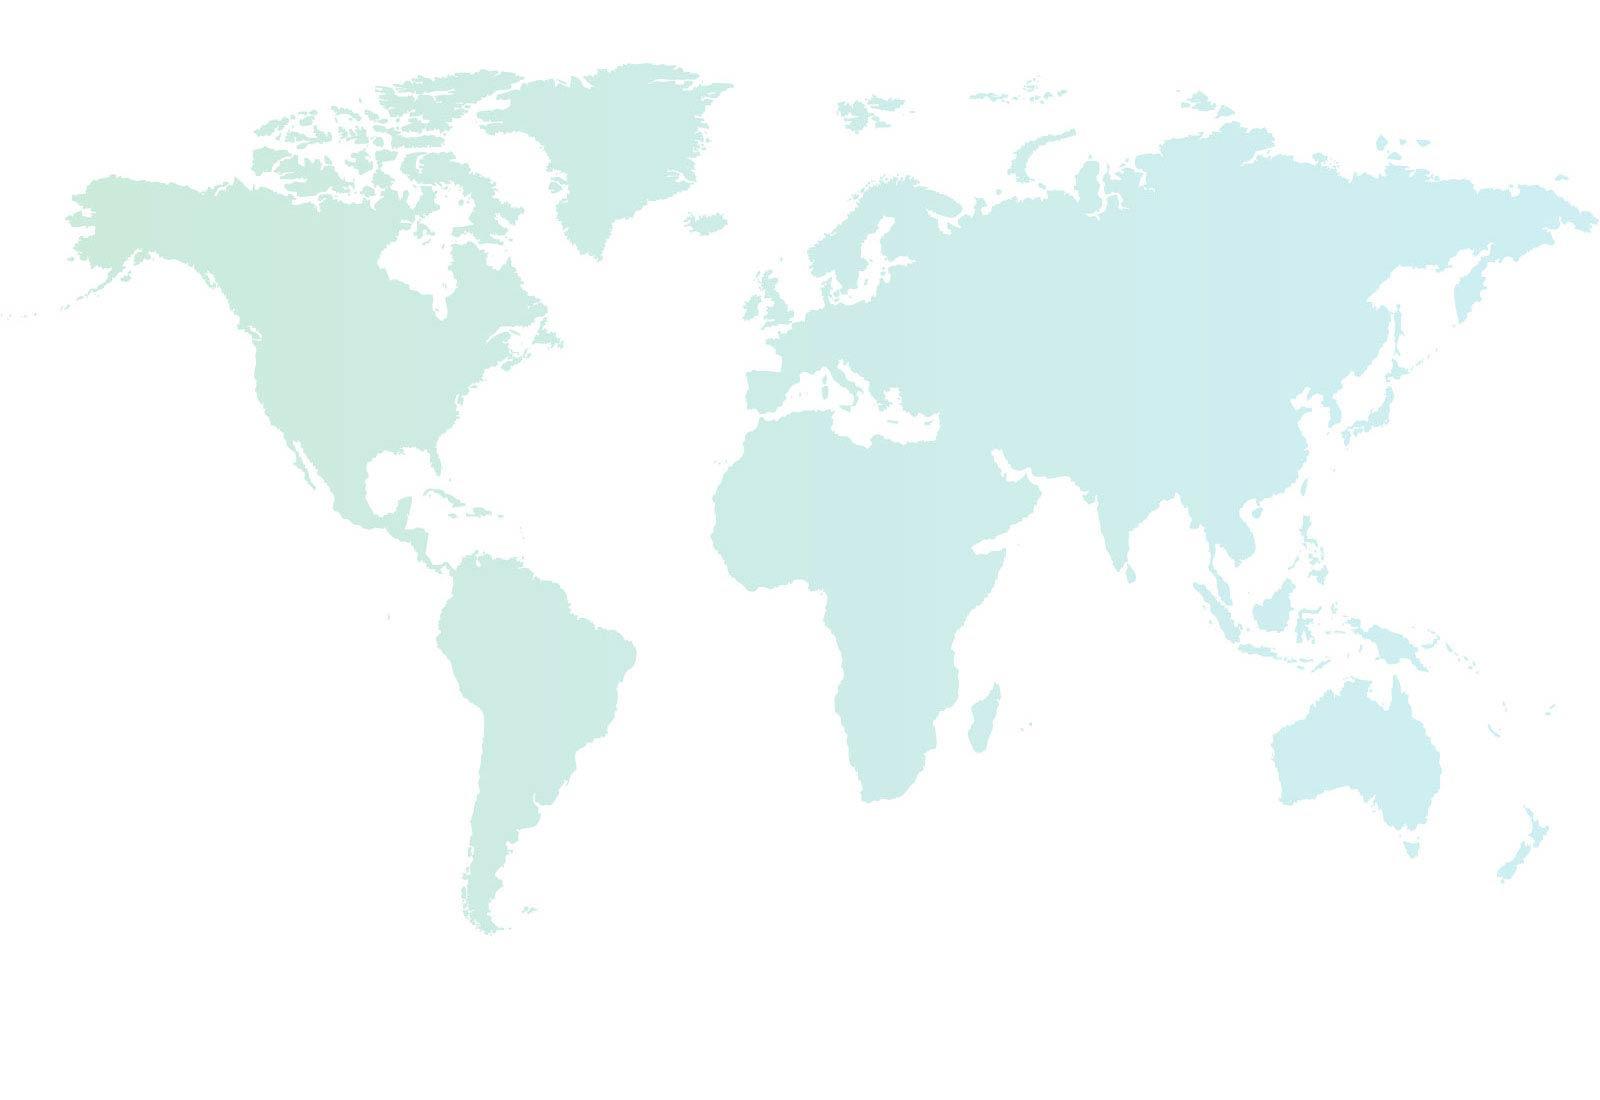 World Map Image Environmental Social u0026 Governance